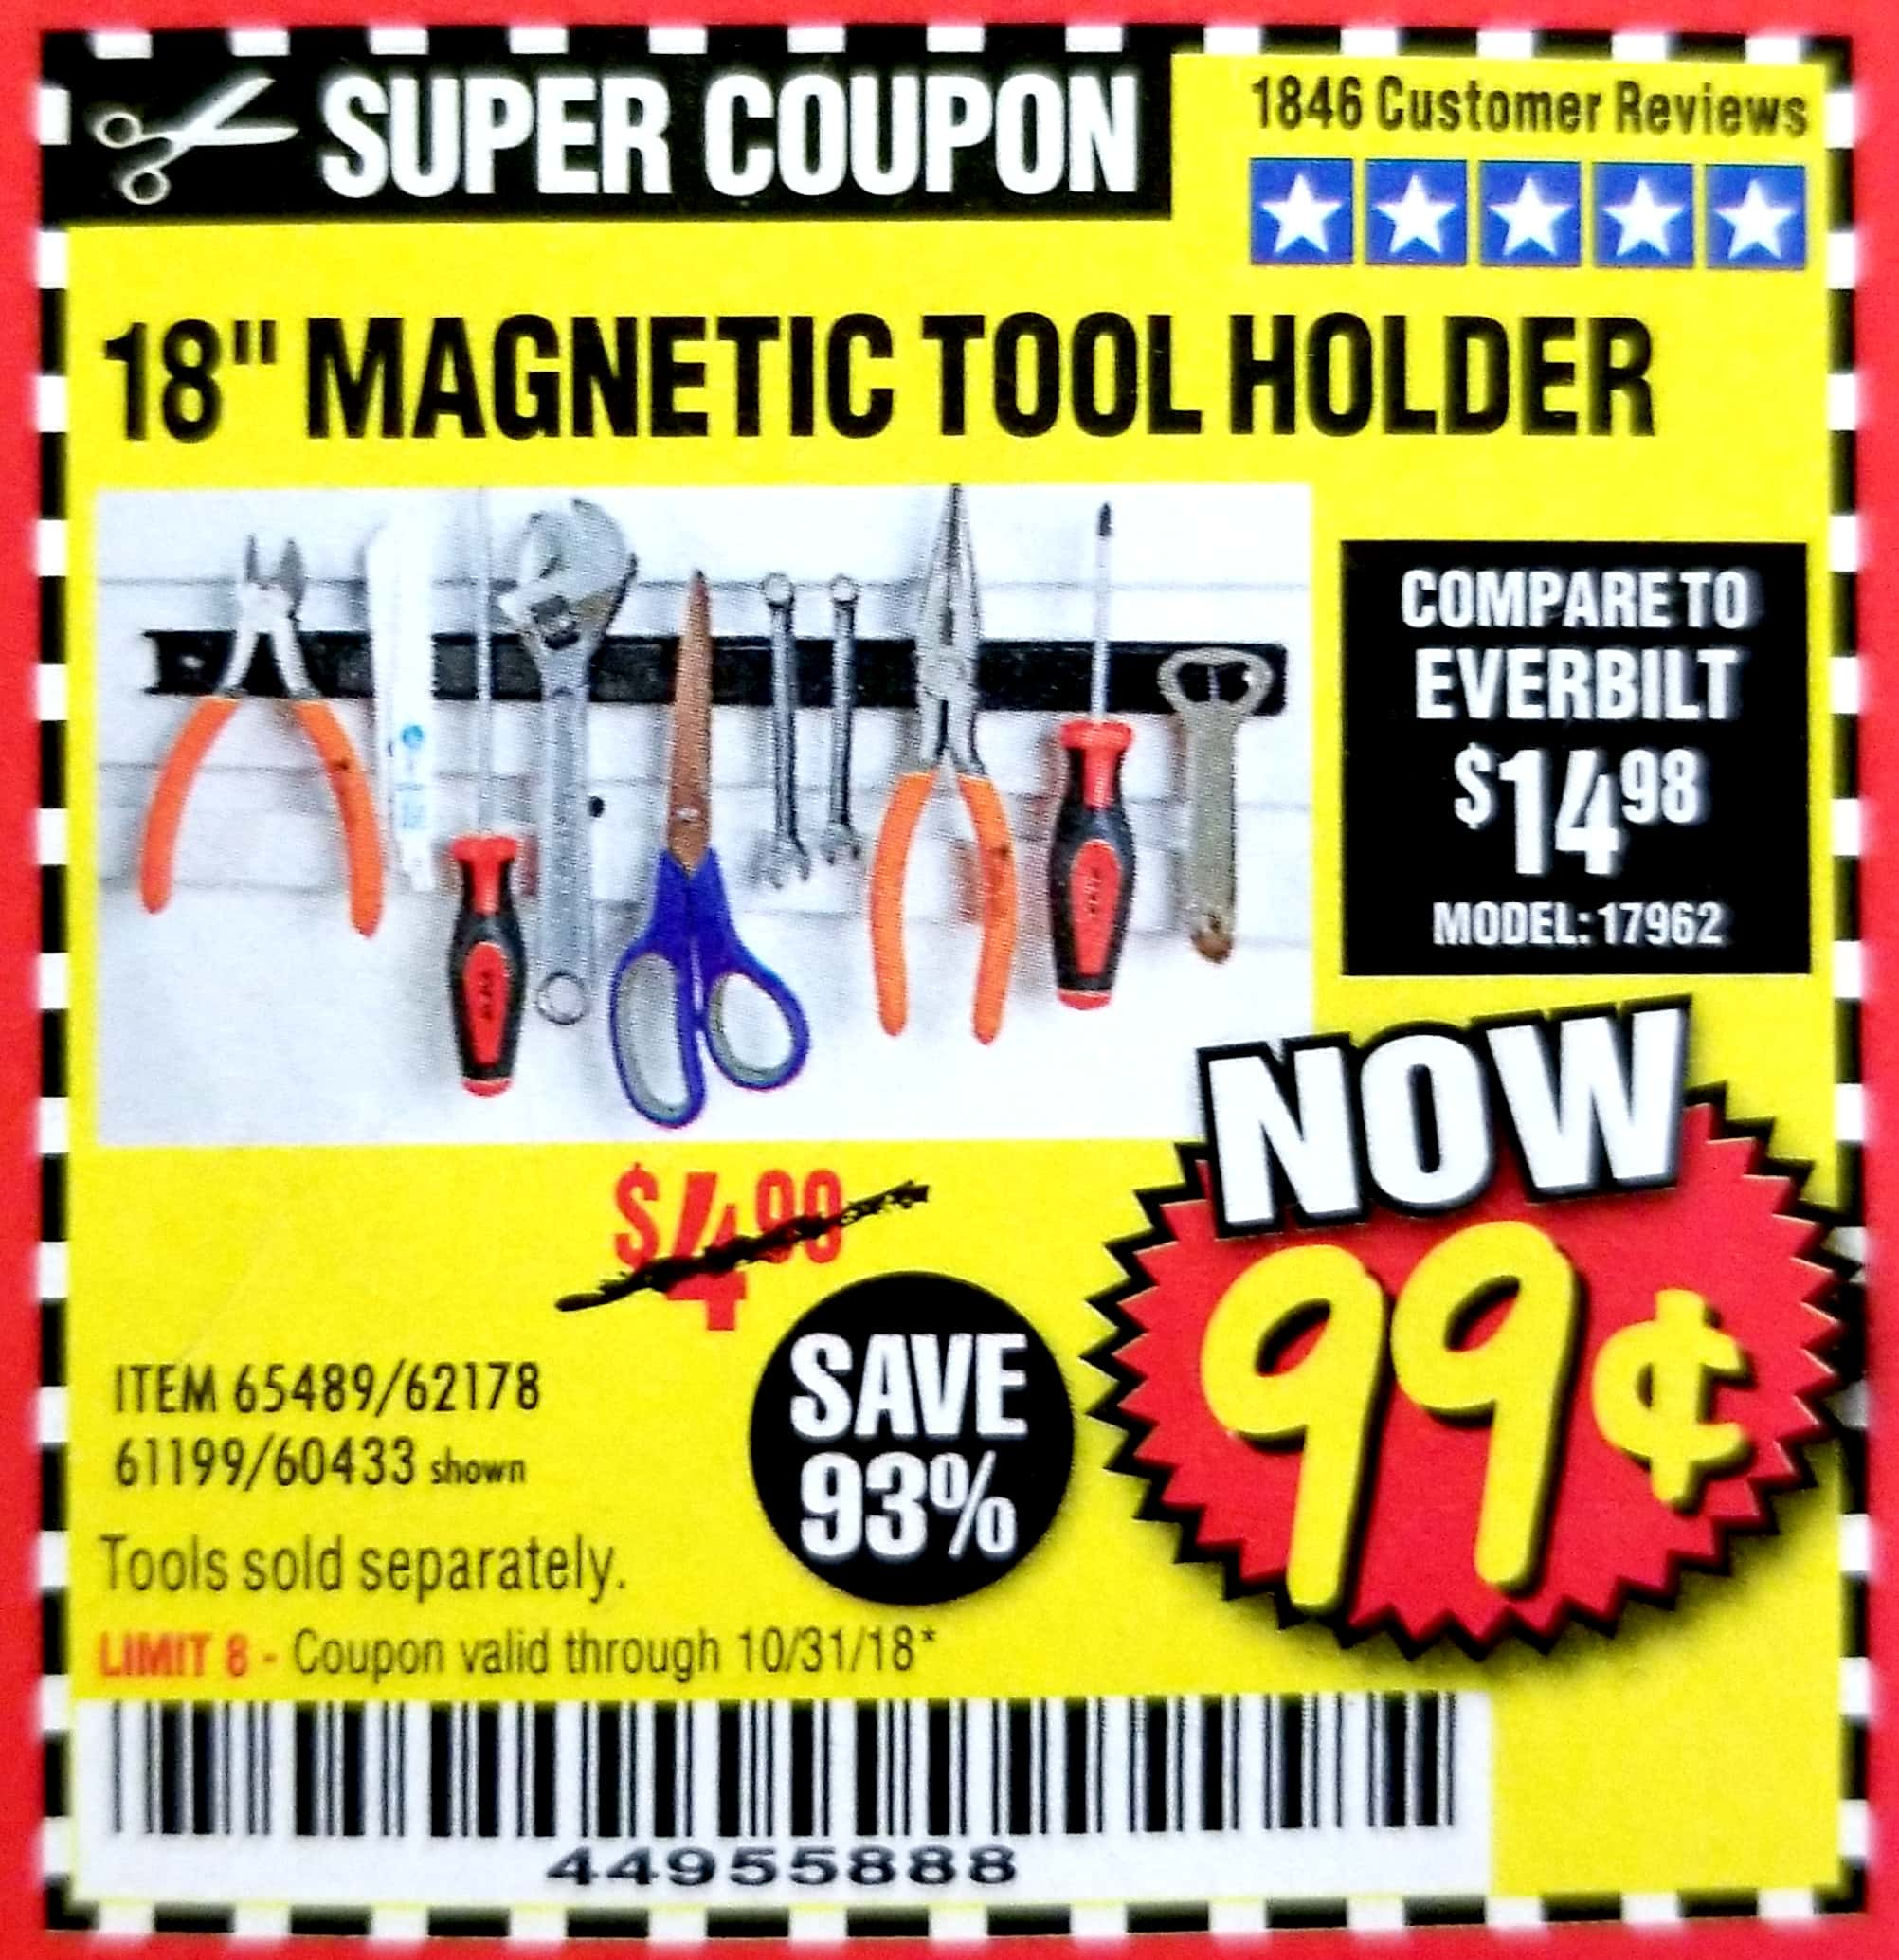 "www.hfqpdb.com - 18"" MAGNETIC TOOL HOLDER Lot No. 65489/60433/61199/62178"